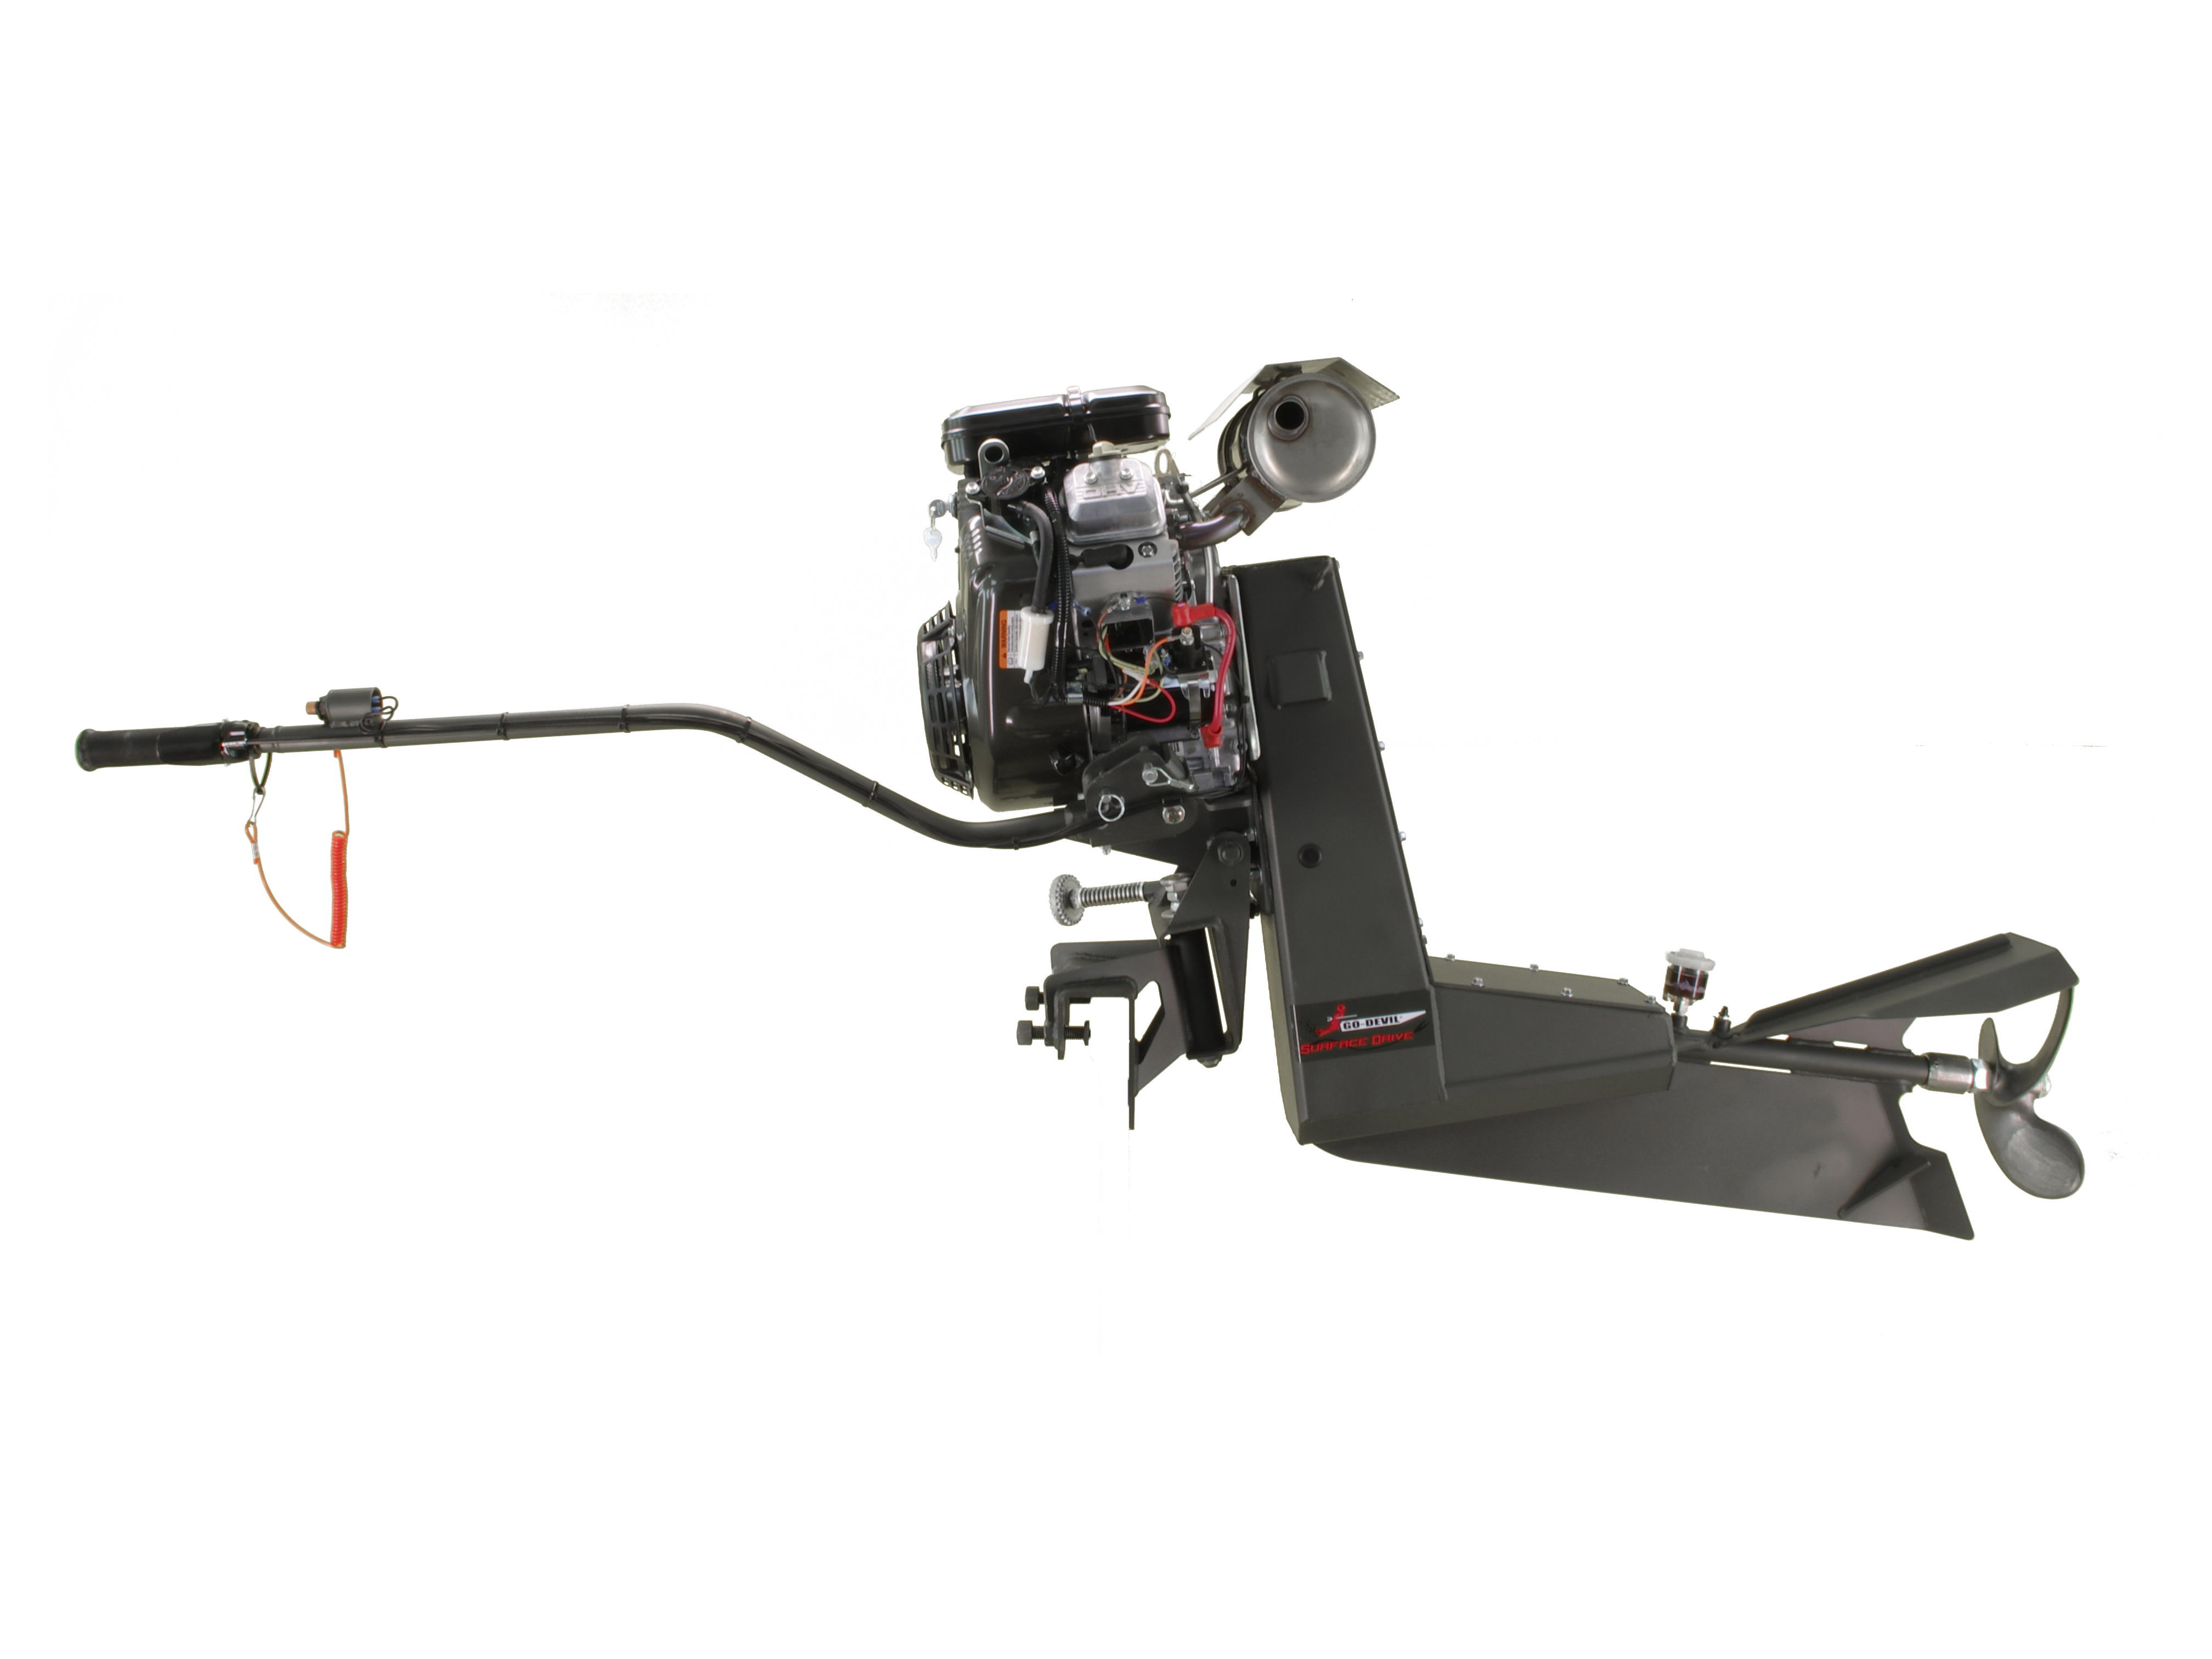 23 HP VANGUARD SURFACE DRIVE - GO-DEVIL Manufacturers